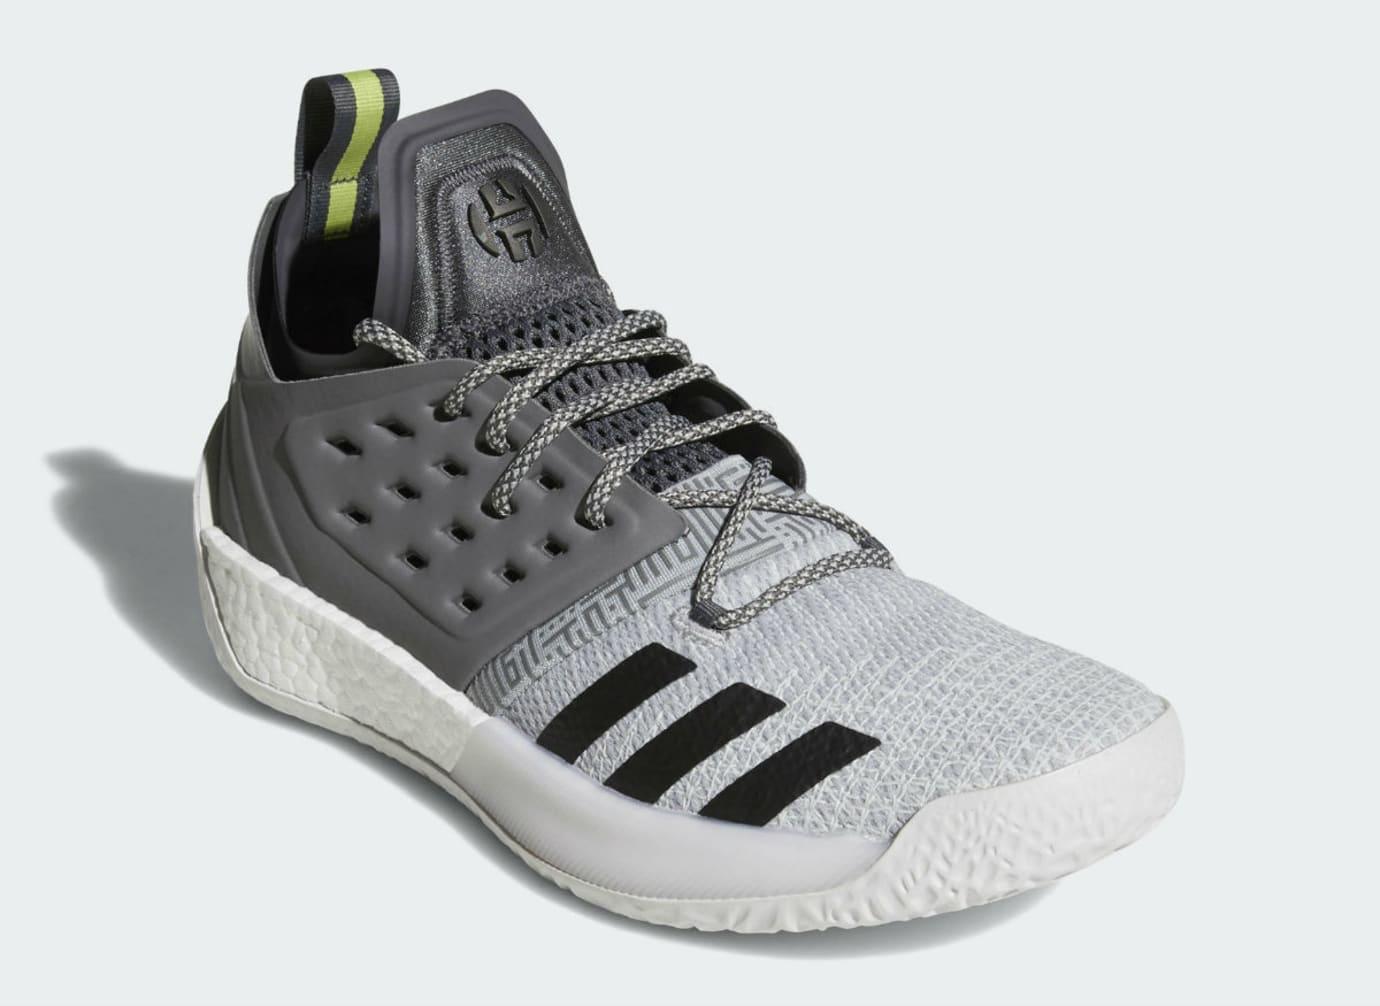 Adidas Harden Vol. 2 Concrete Grey Release Date AH2122 Front